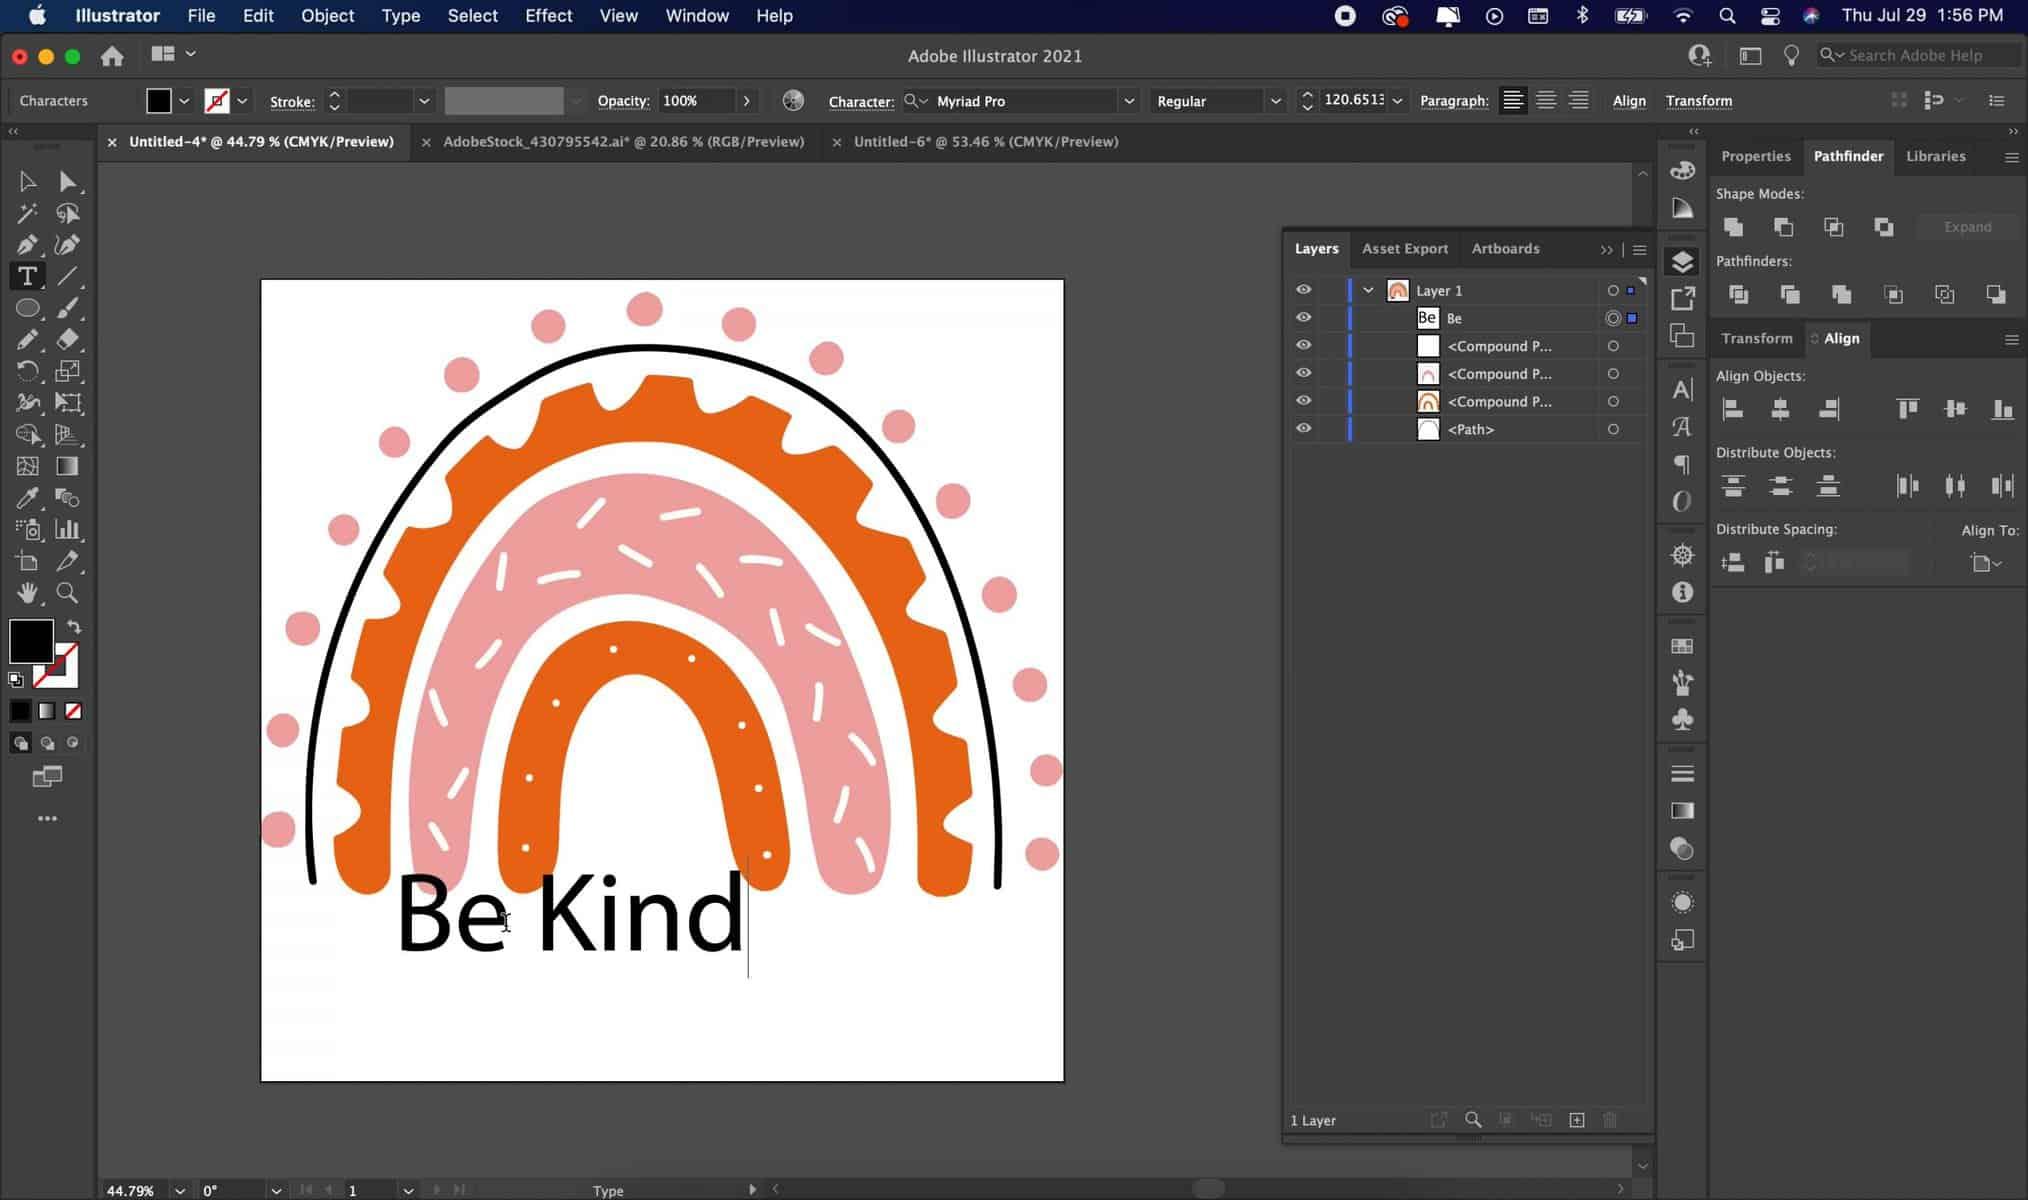 screenshot of adobe illustrator typing text to make an SVG